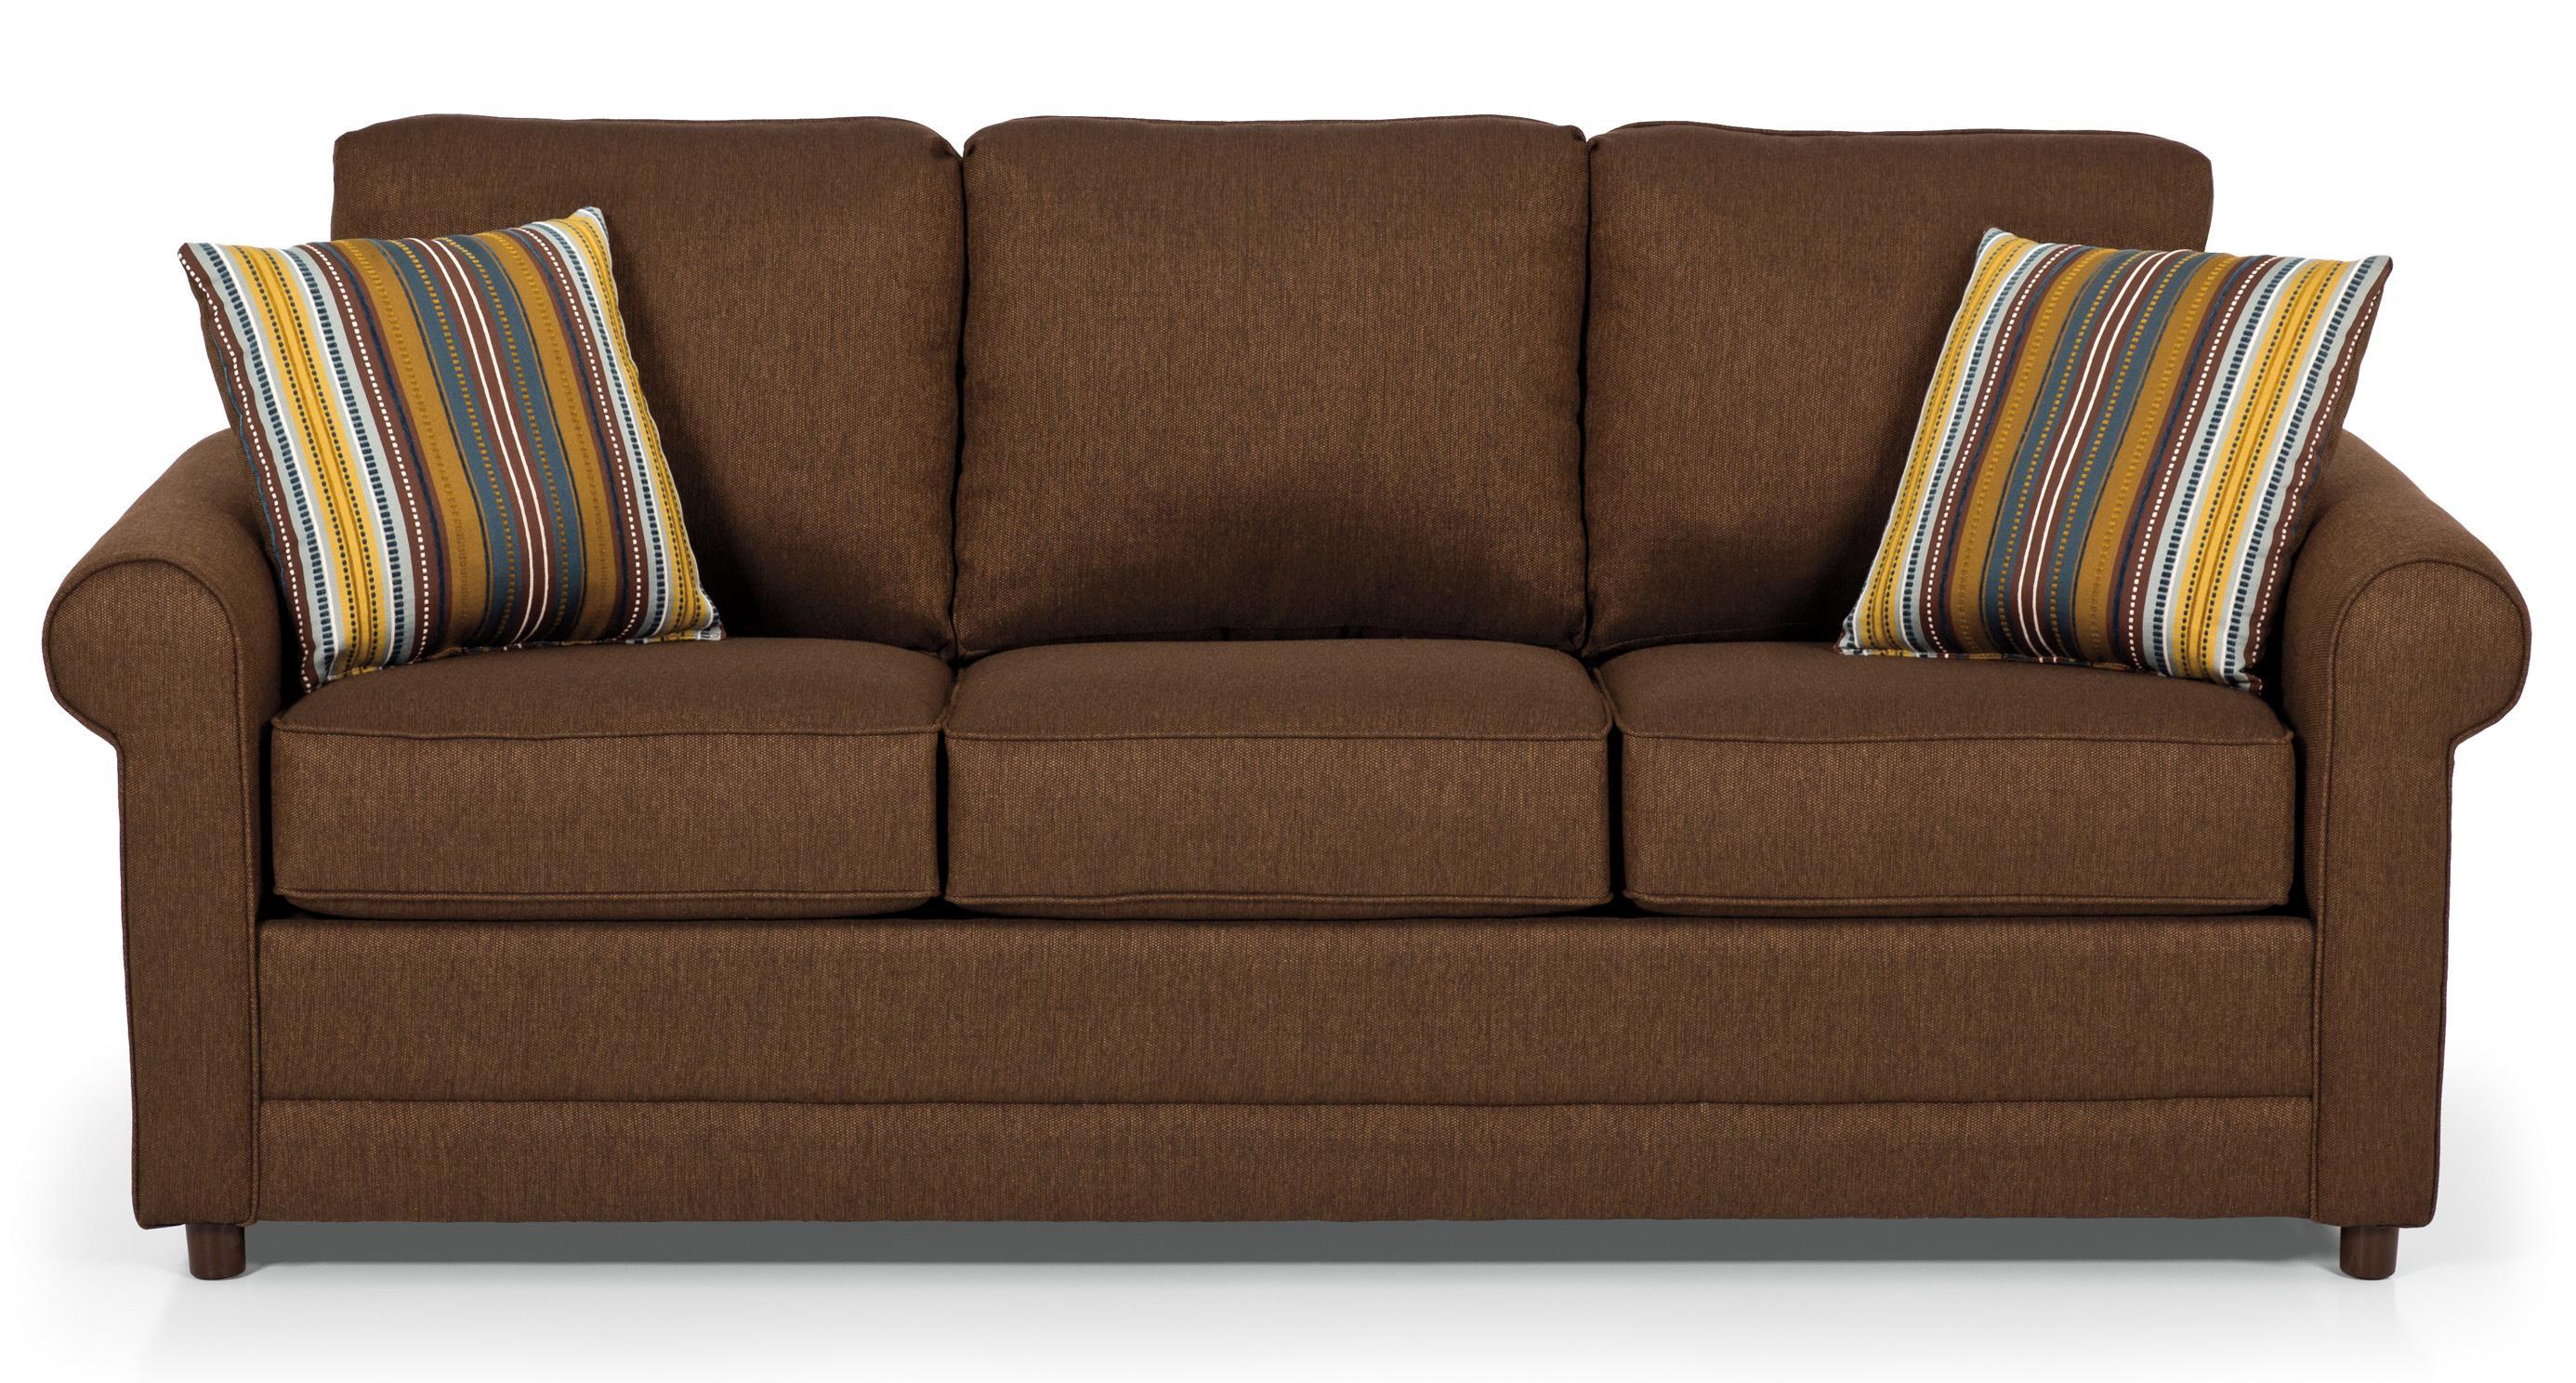 202 Queen Gel Sleeper by Stanton at Wilson's Furniture